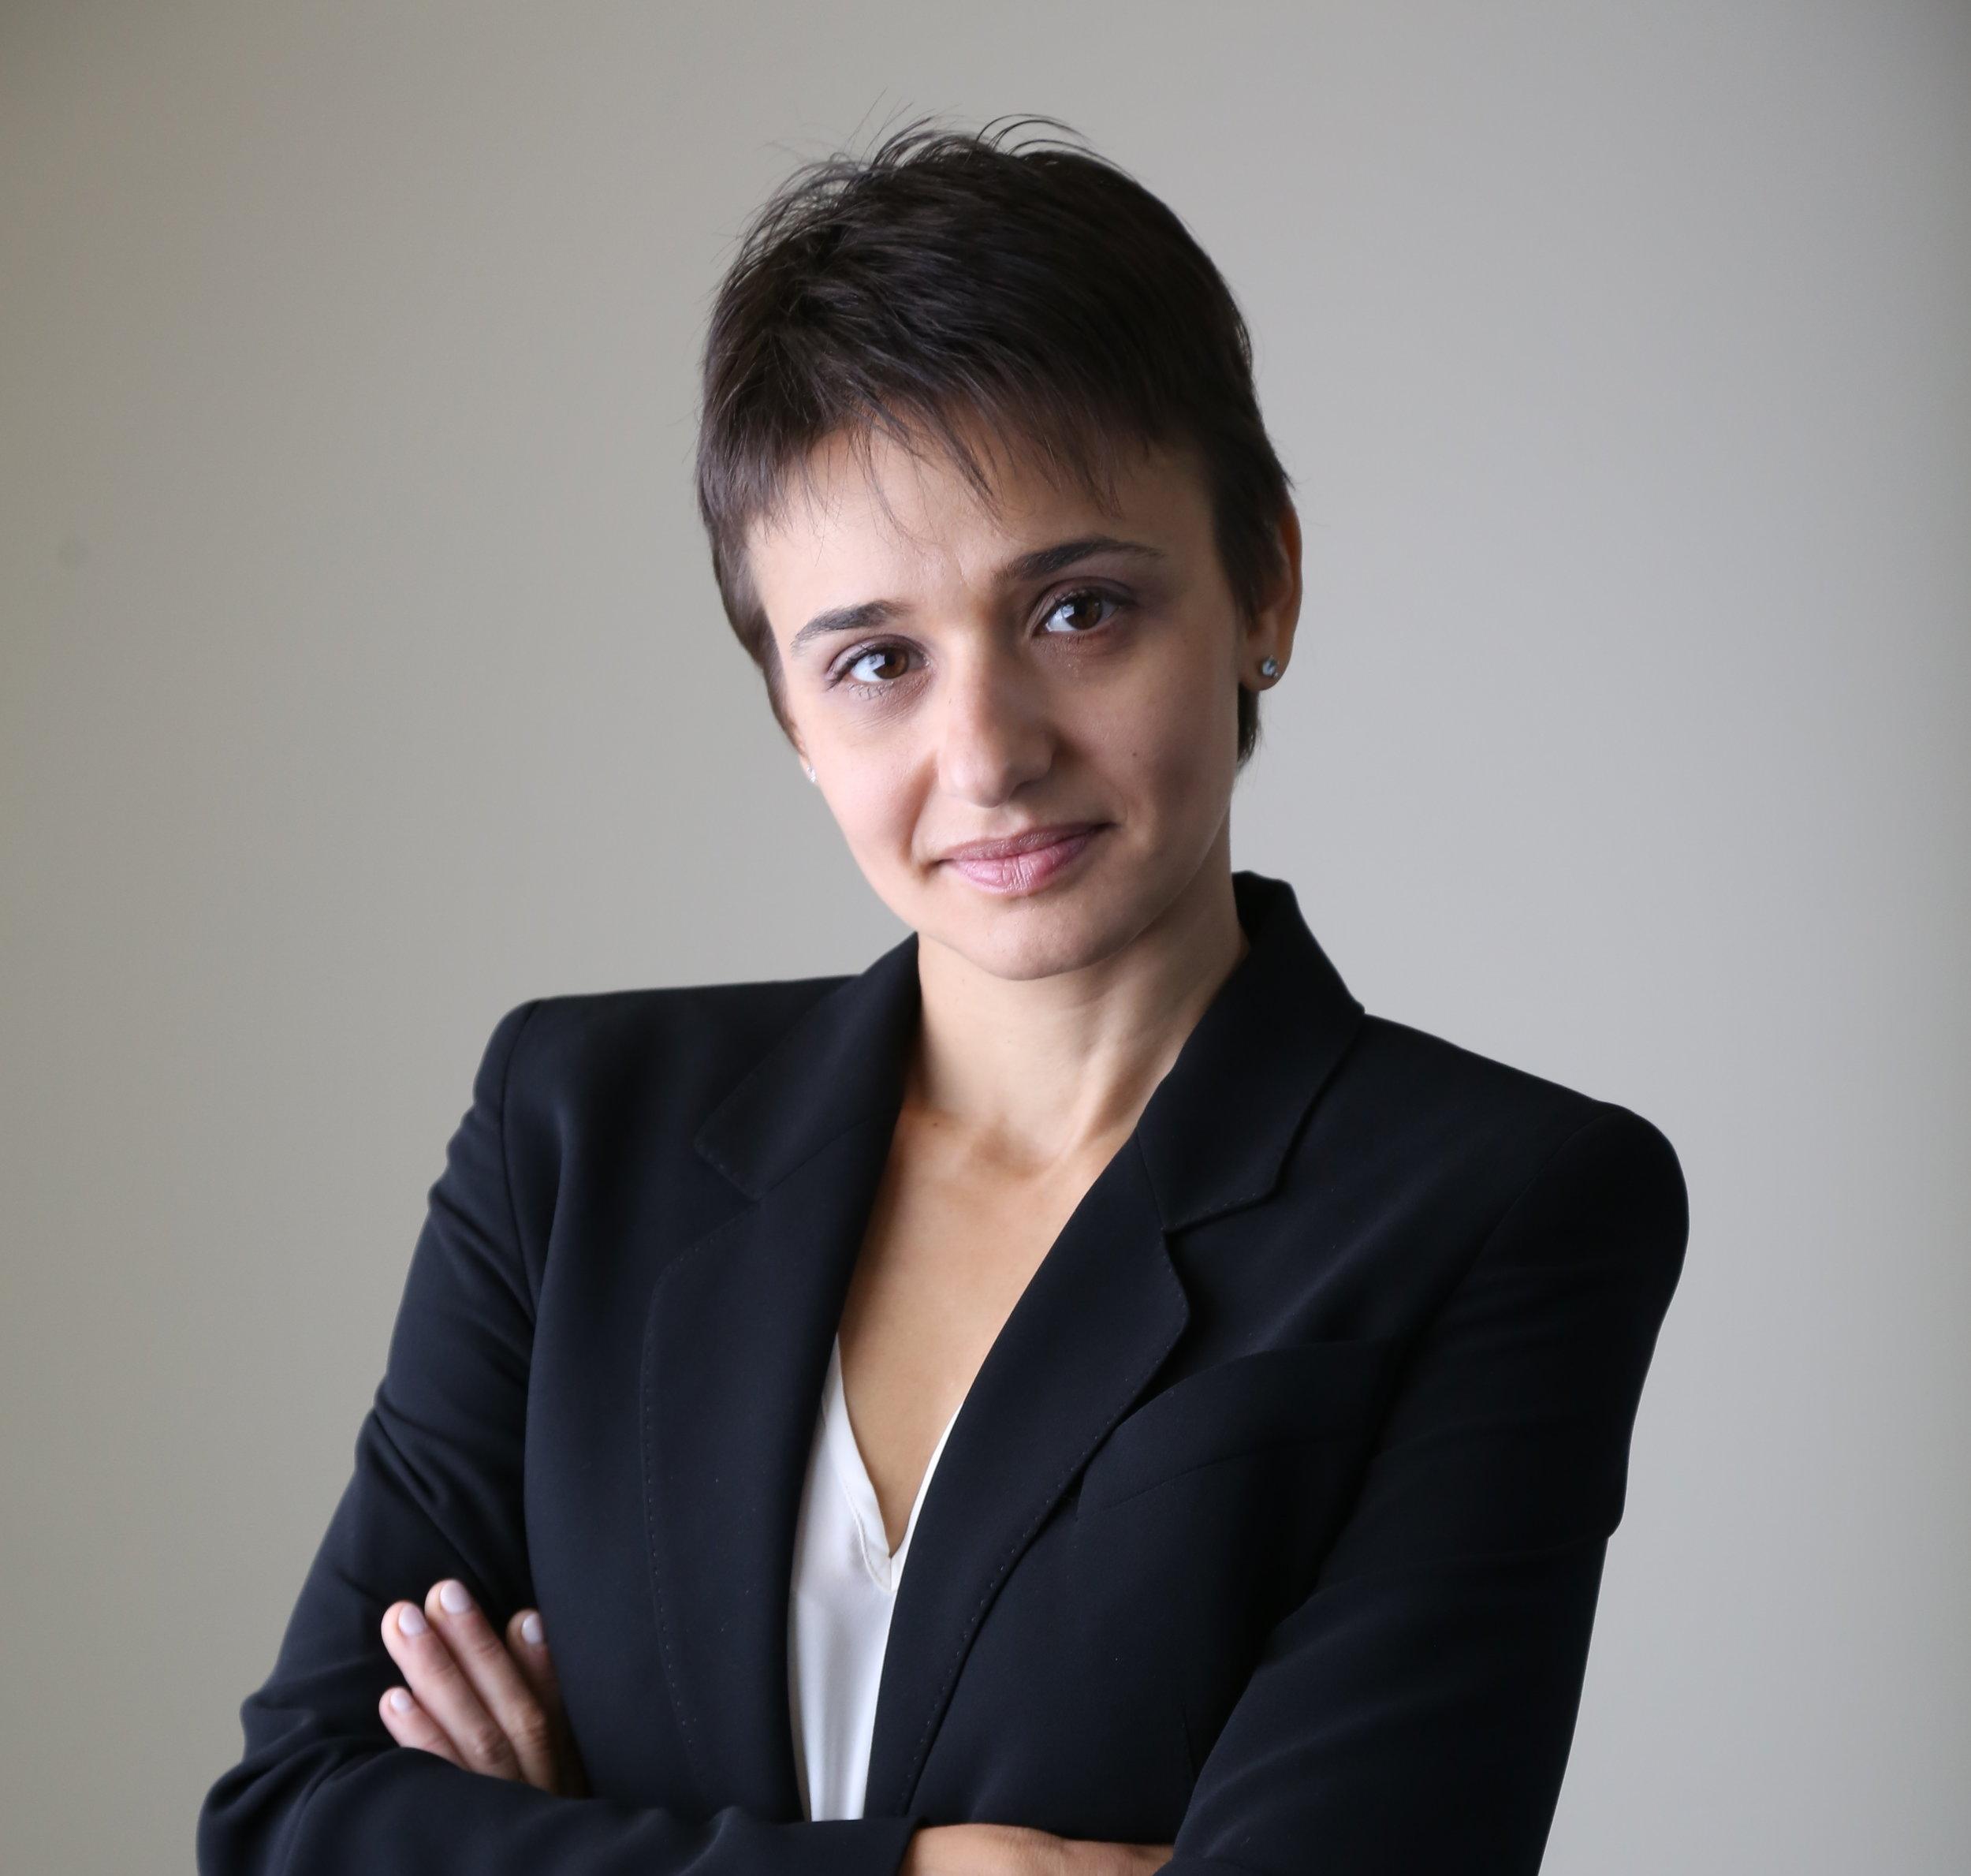 About Dr. Piryatinsky -